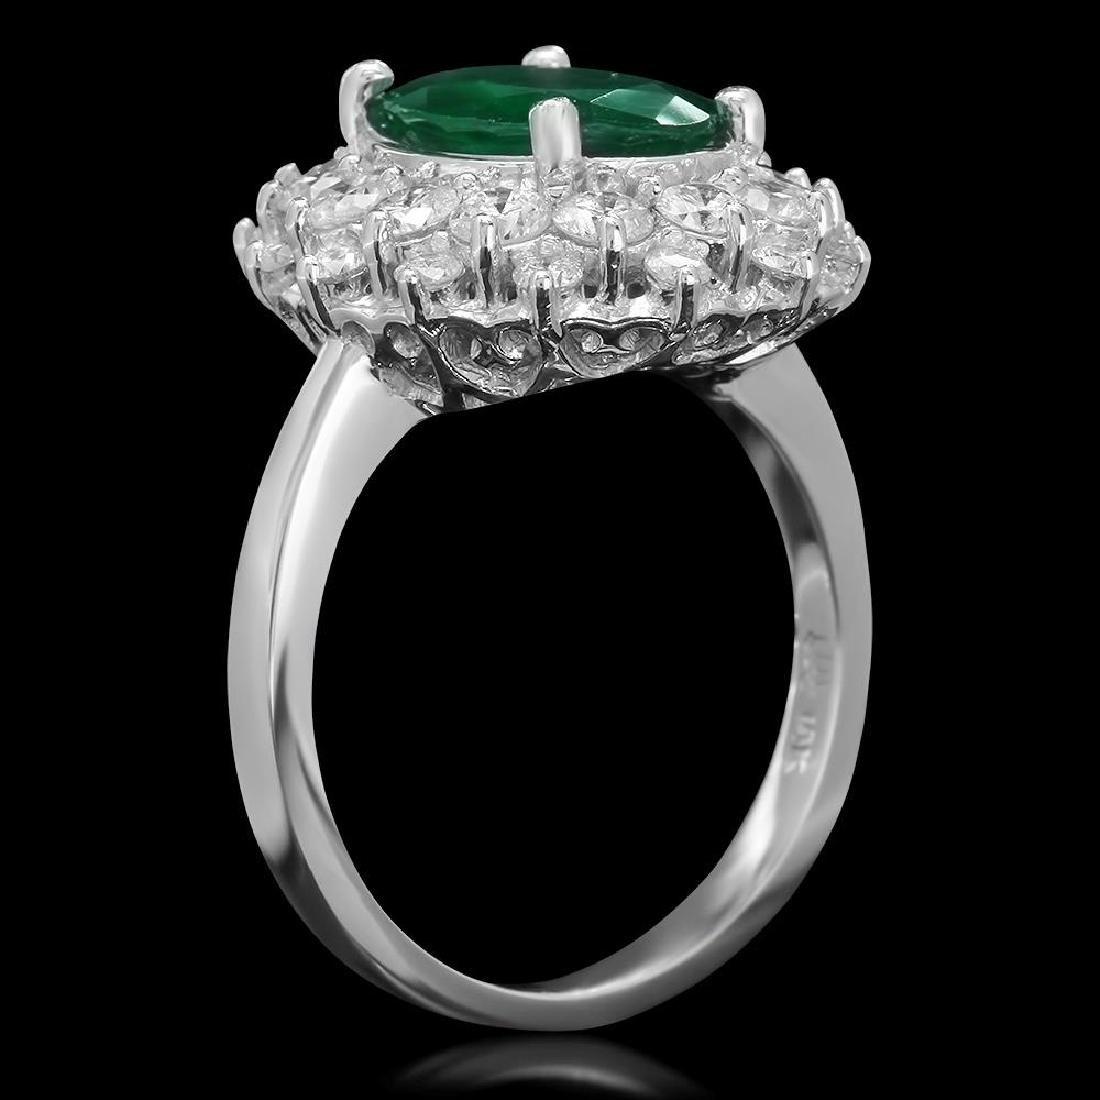 14K Gold 2.08ct Emerald 1.59ct Diamond Ring - 2